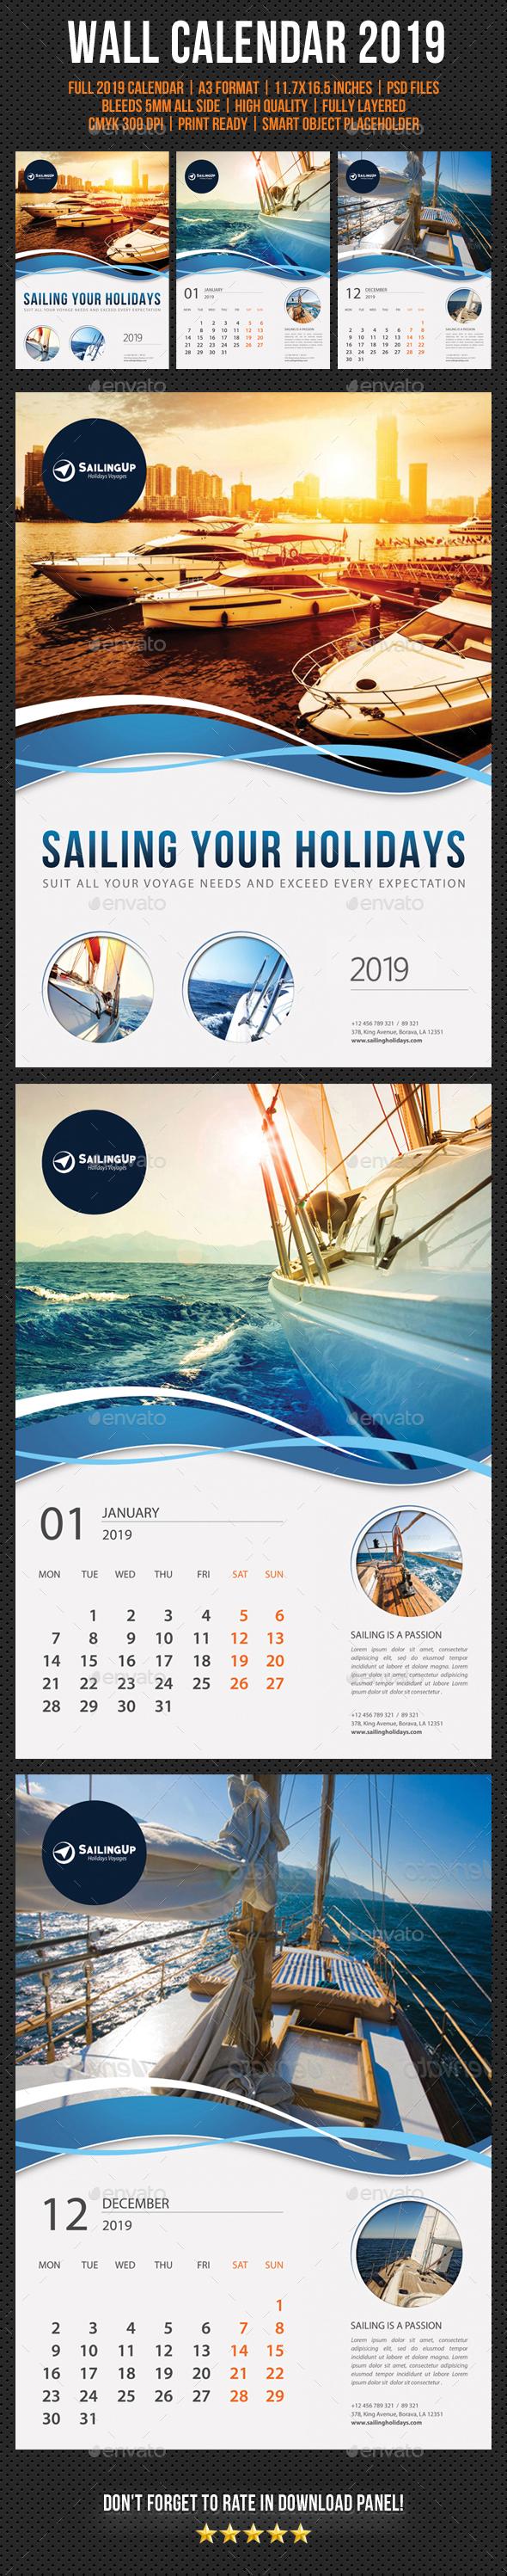 Wall Calendar 2019 V15 - Calendars Stationery